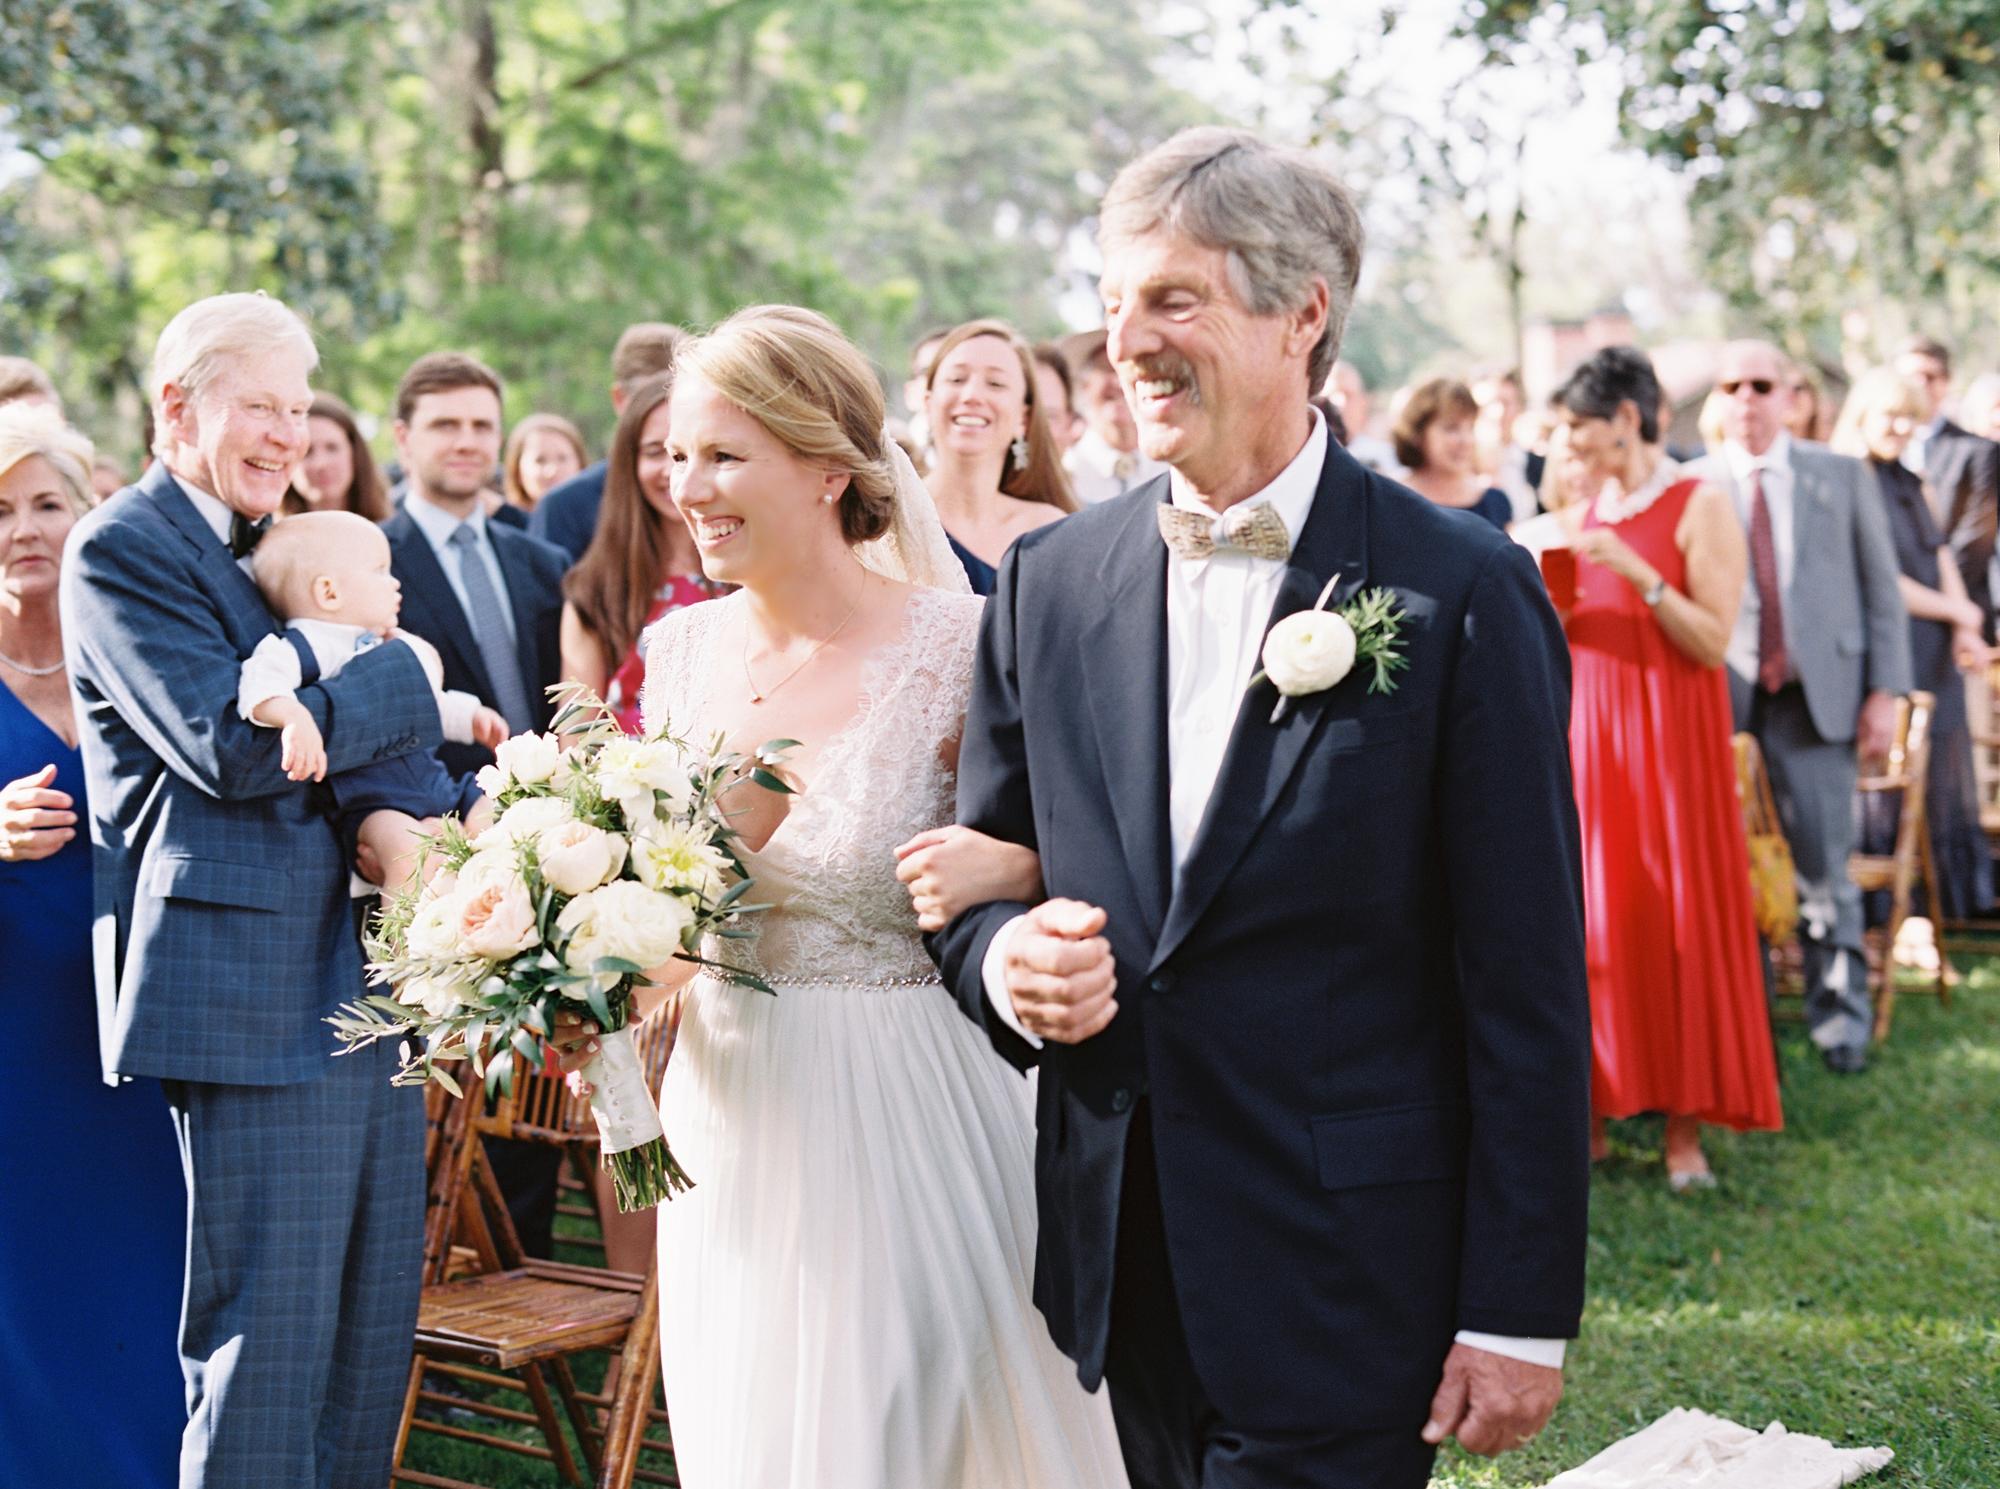 southern-wedding-26.jpg